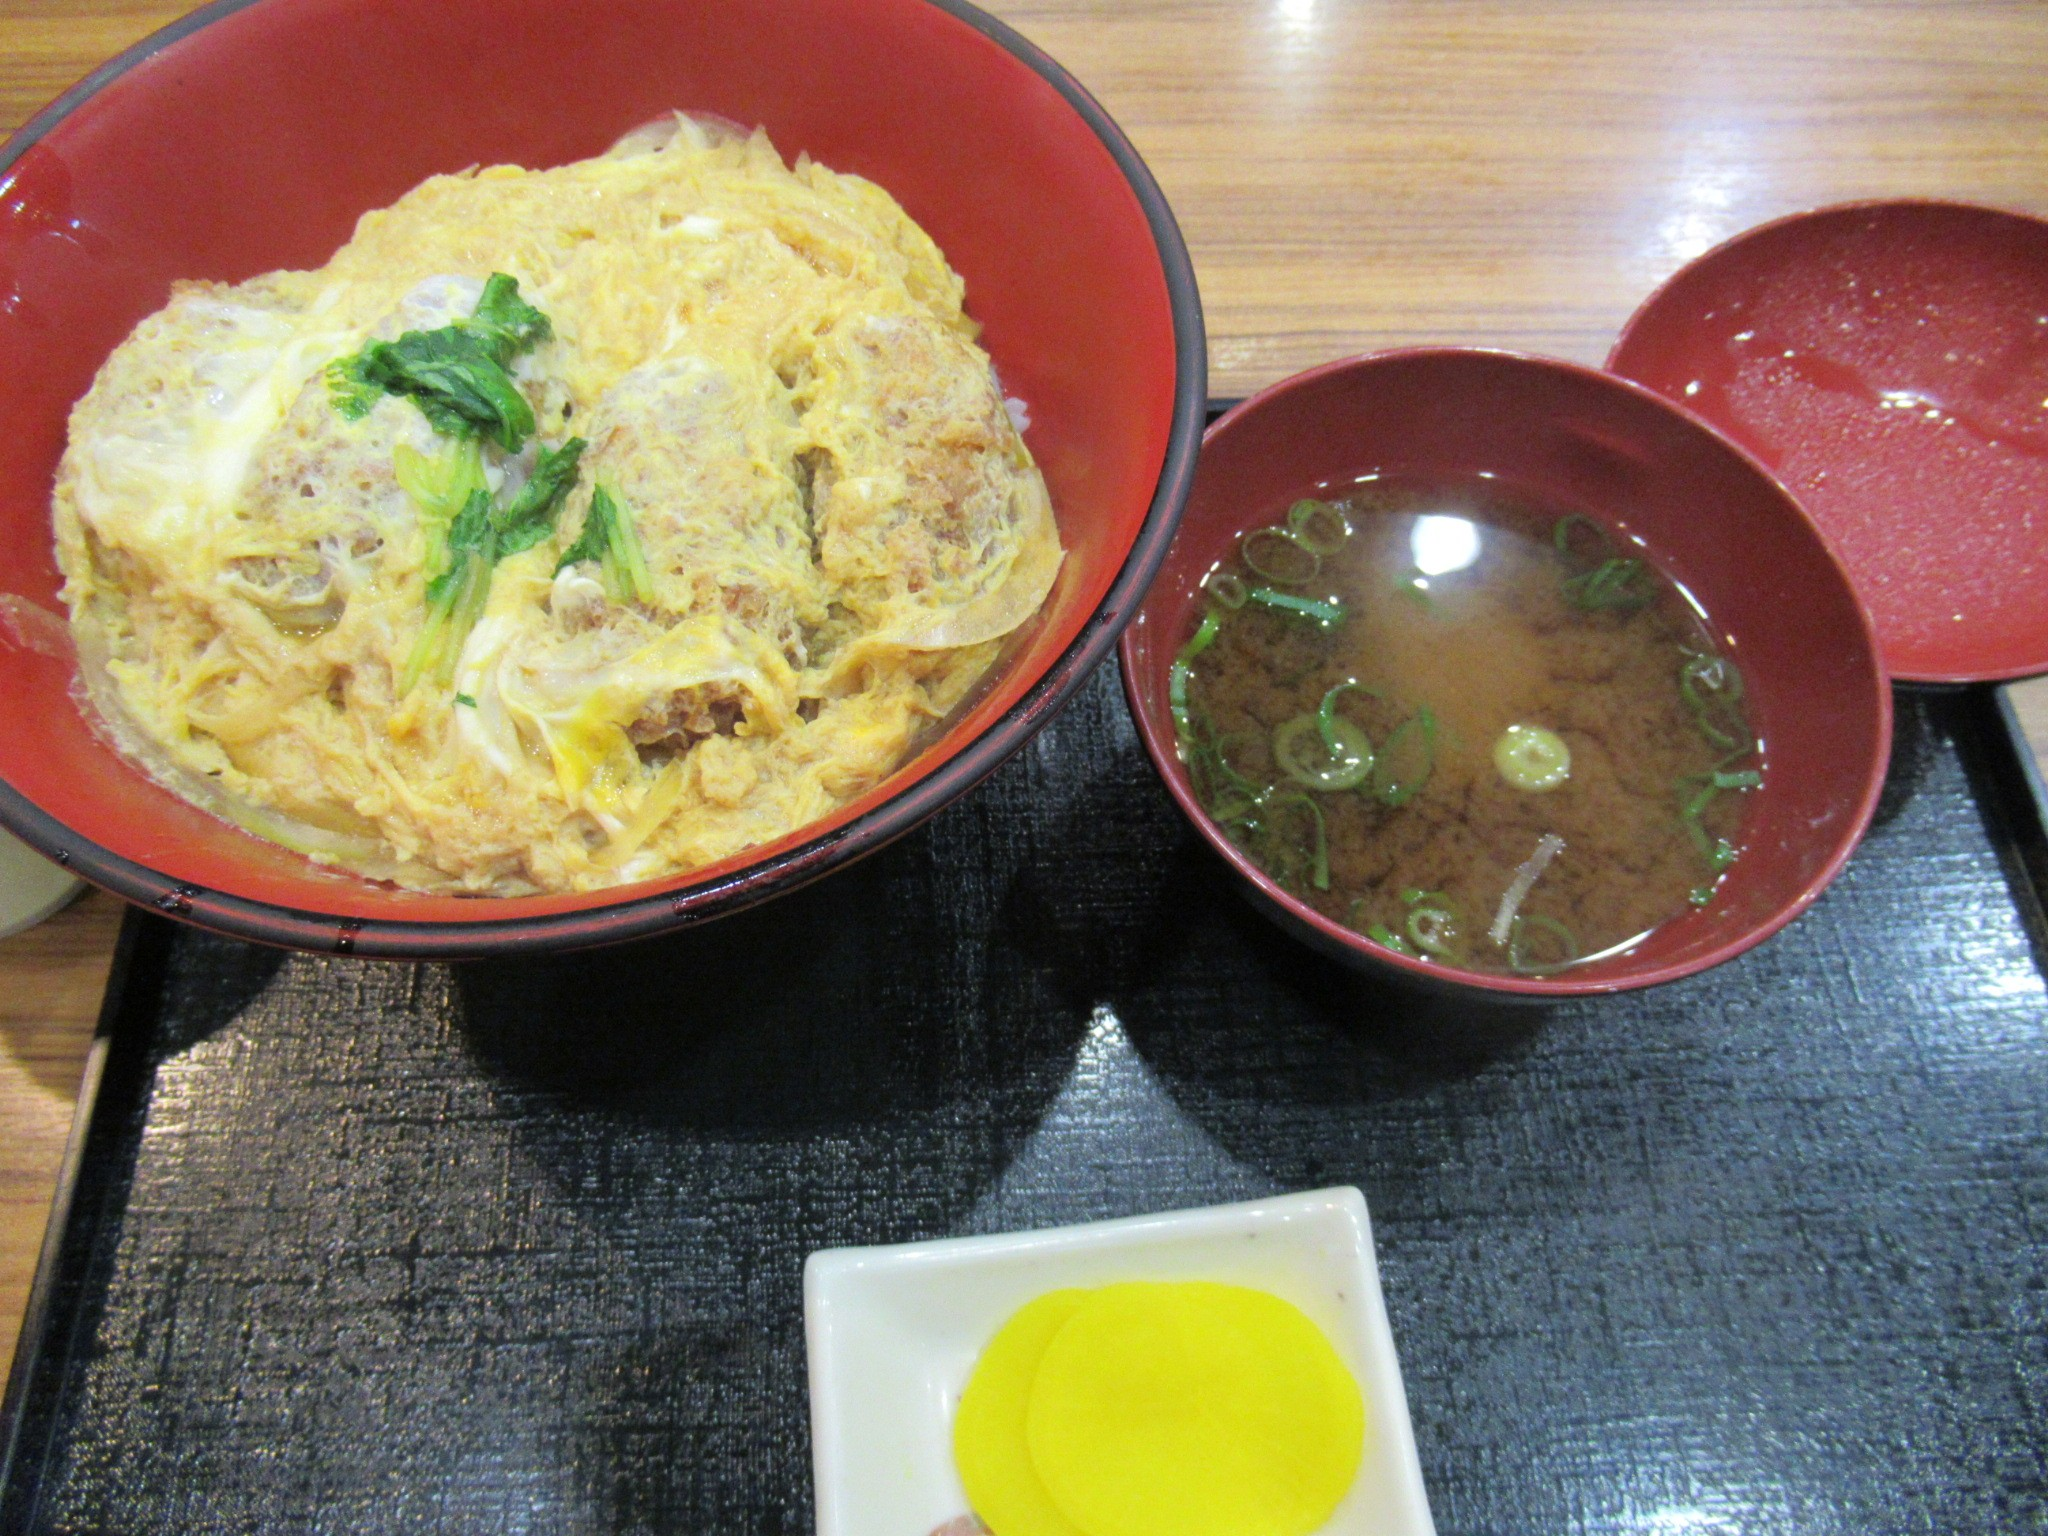 f:id:ichi-hama:20190115210238j:image